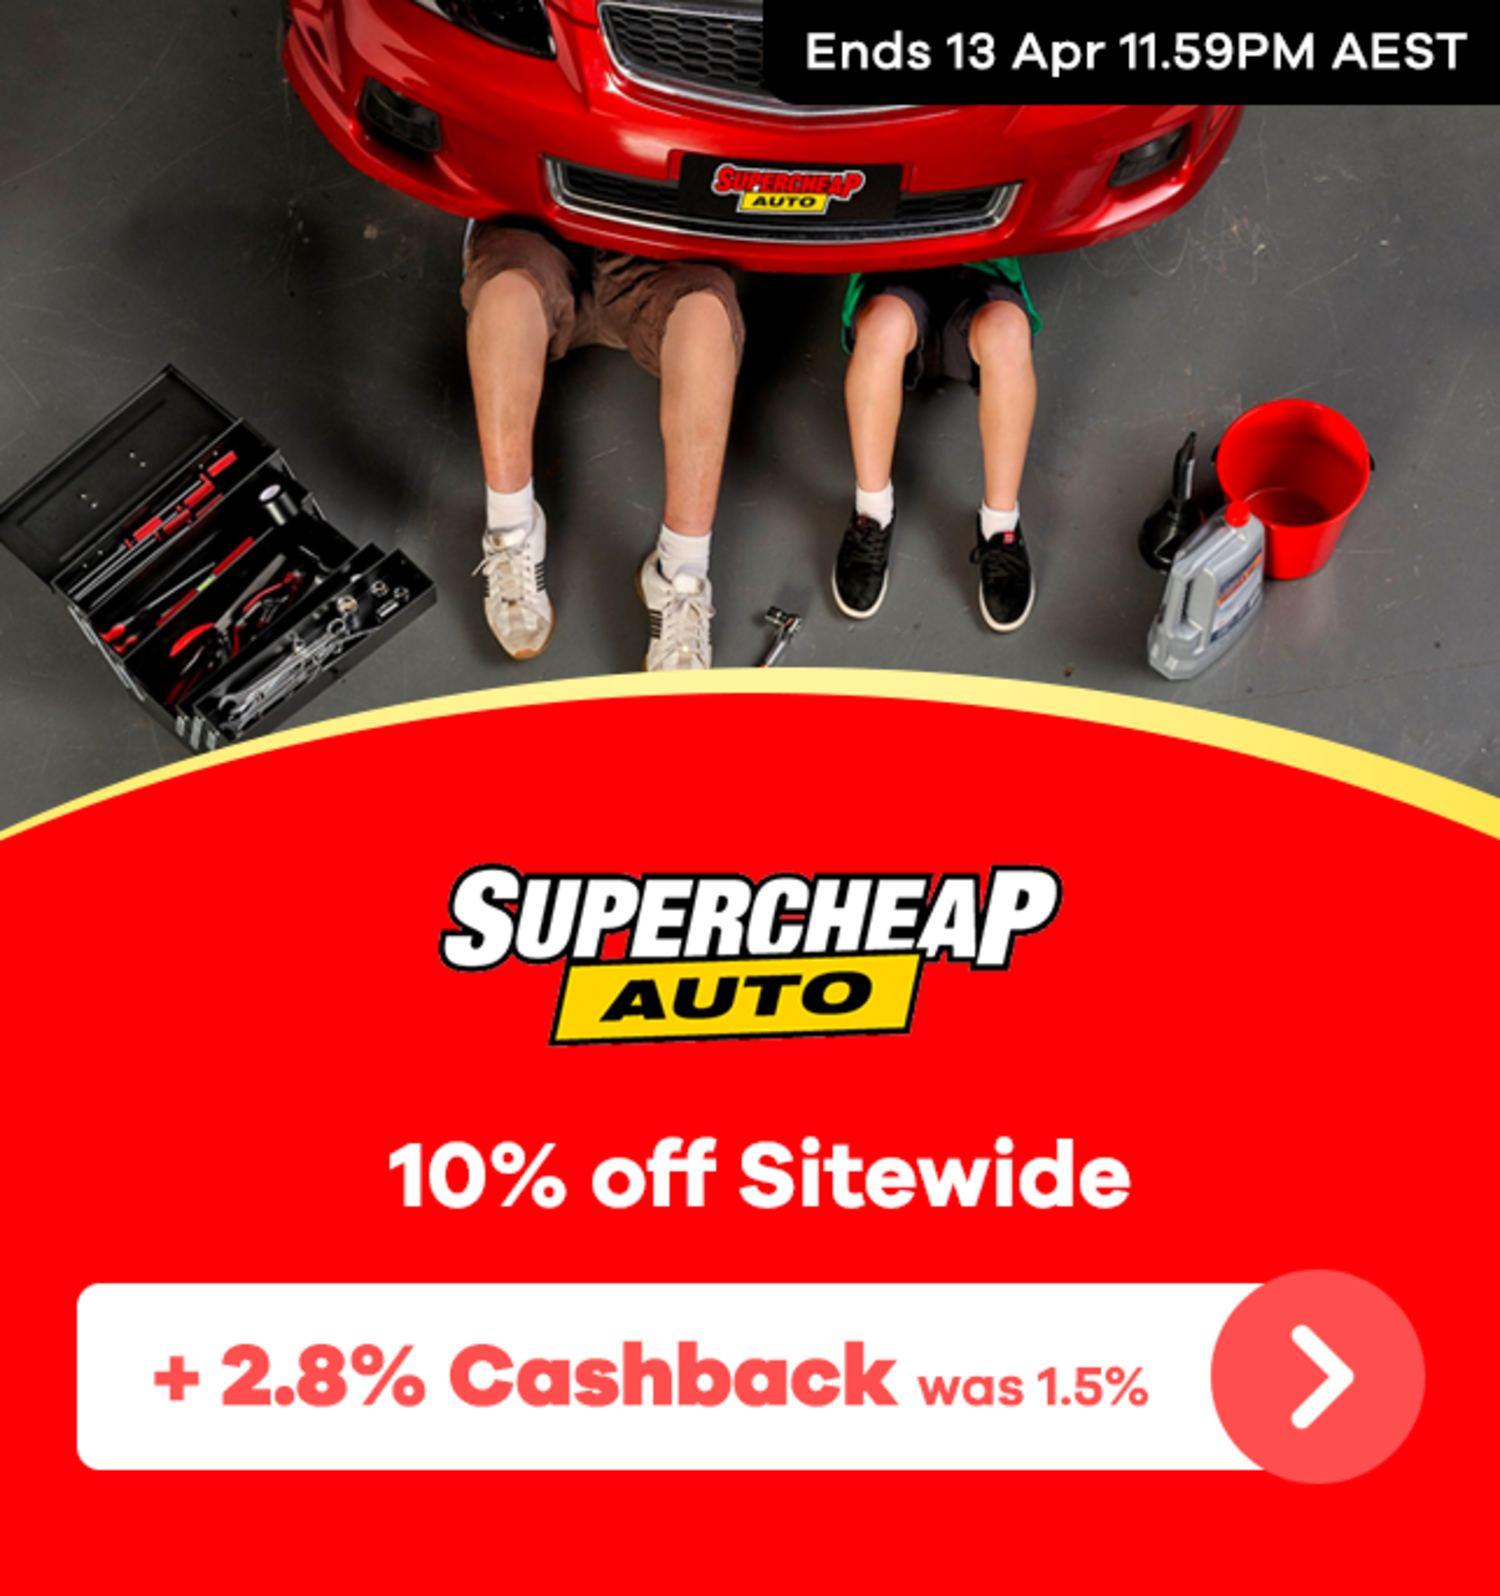 Supercheap Auto - 2.8% Upsized Cashback (April 2020)